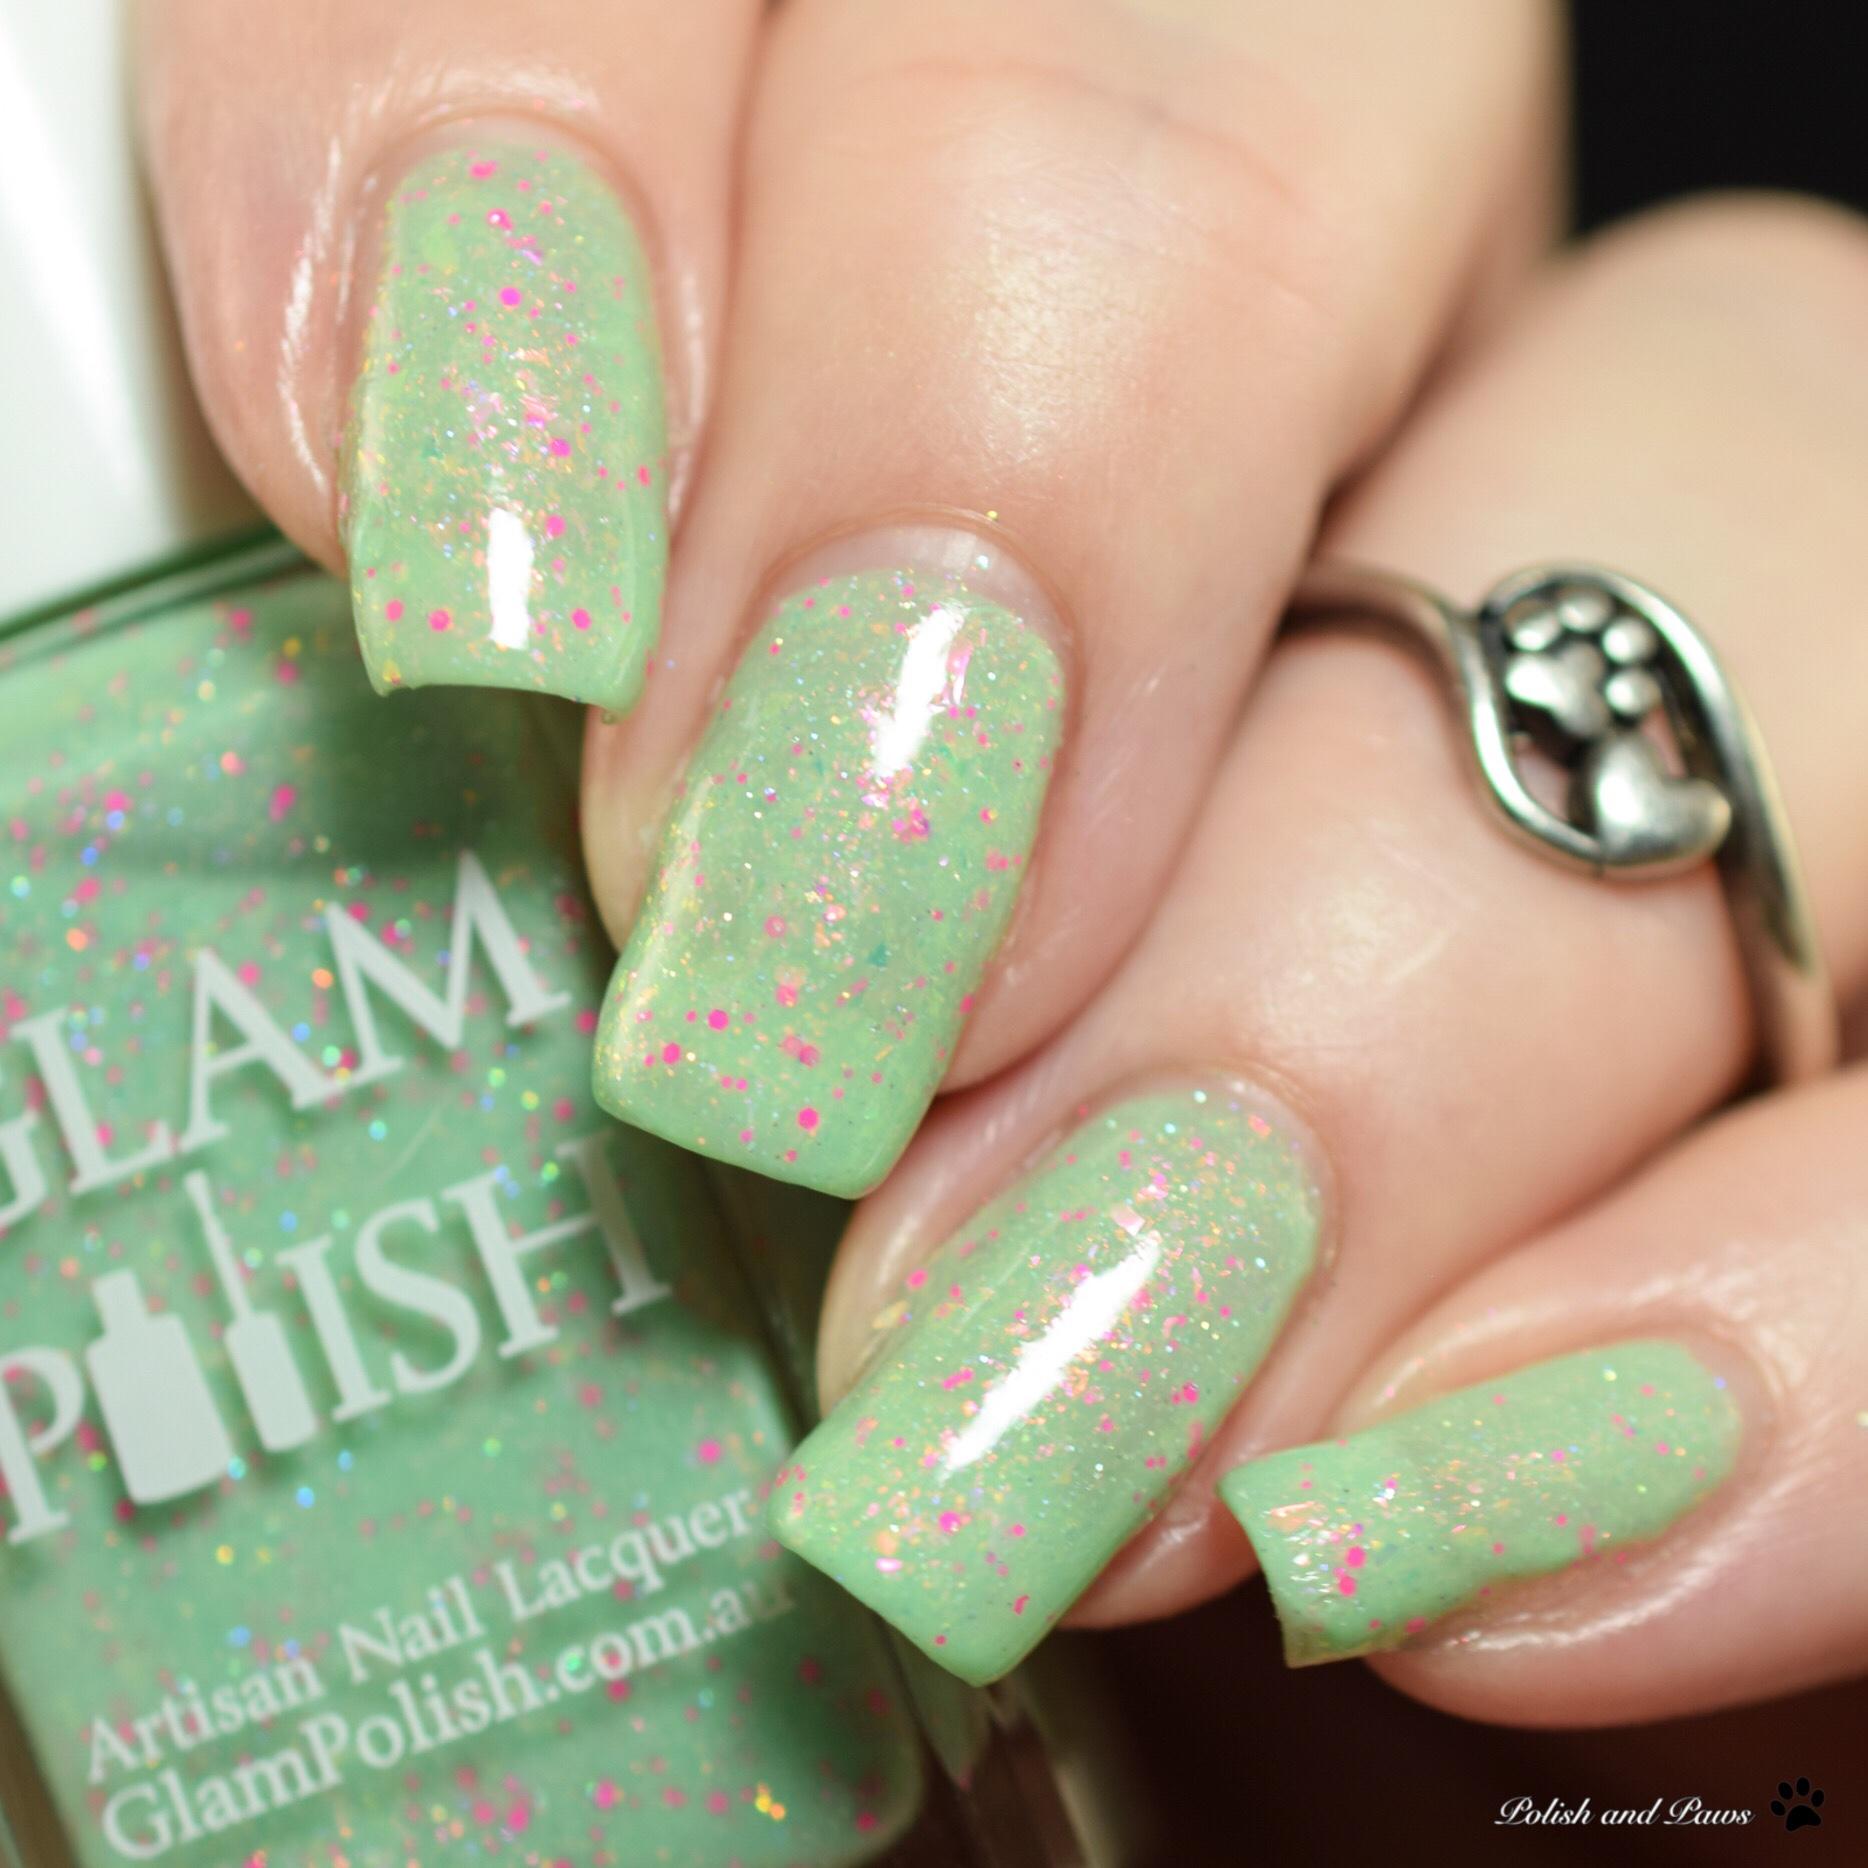 Glam Polish Daydream Believer